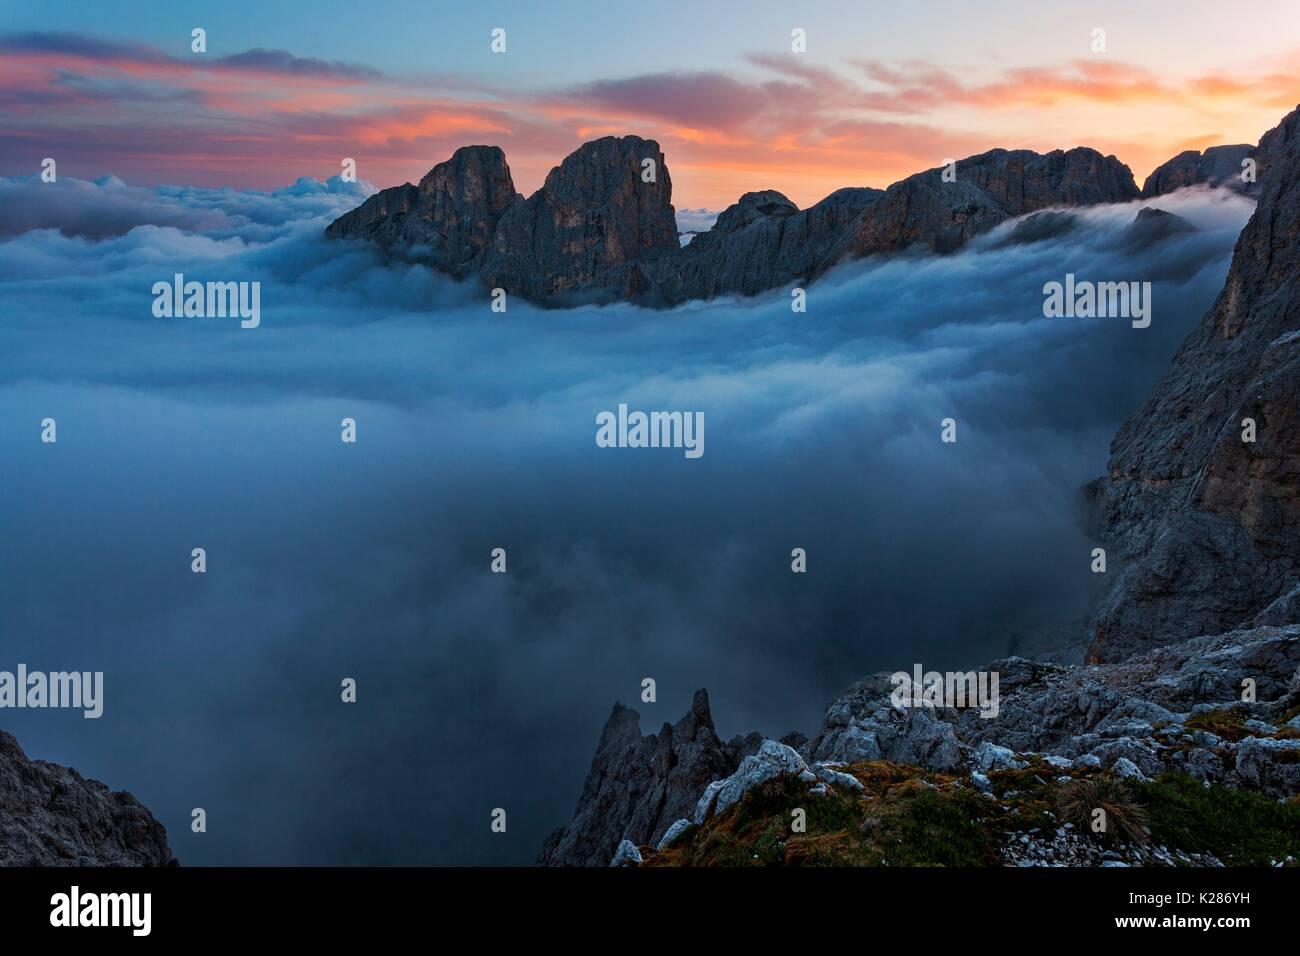 Laurin Pass, Catinaccio-Rosengarten, Dolomites, South Tyrol, Italy. - Stock Image